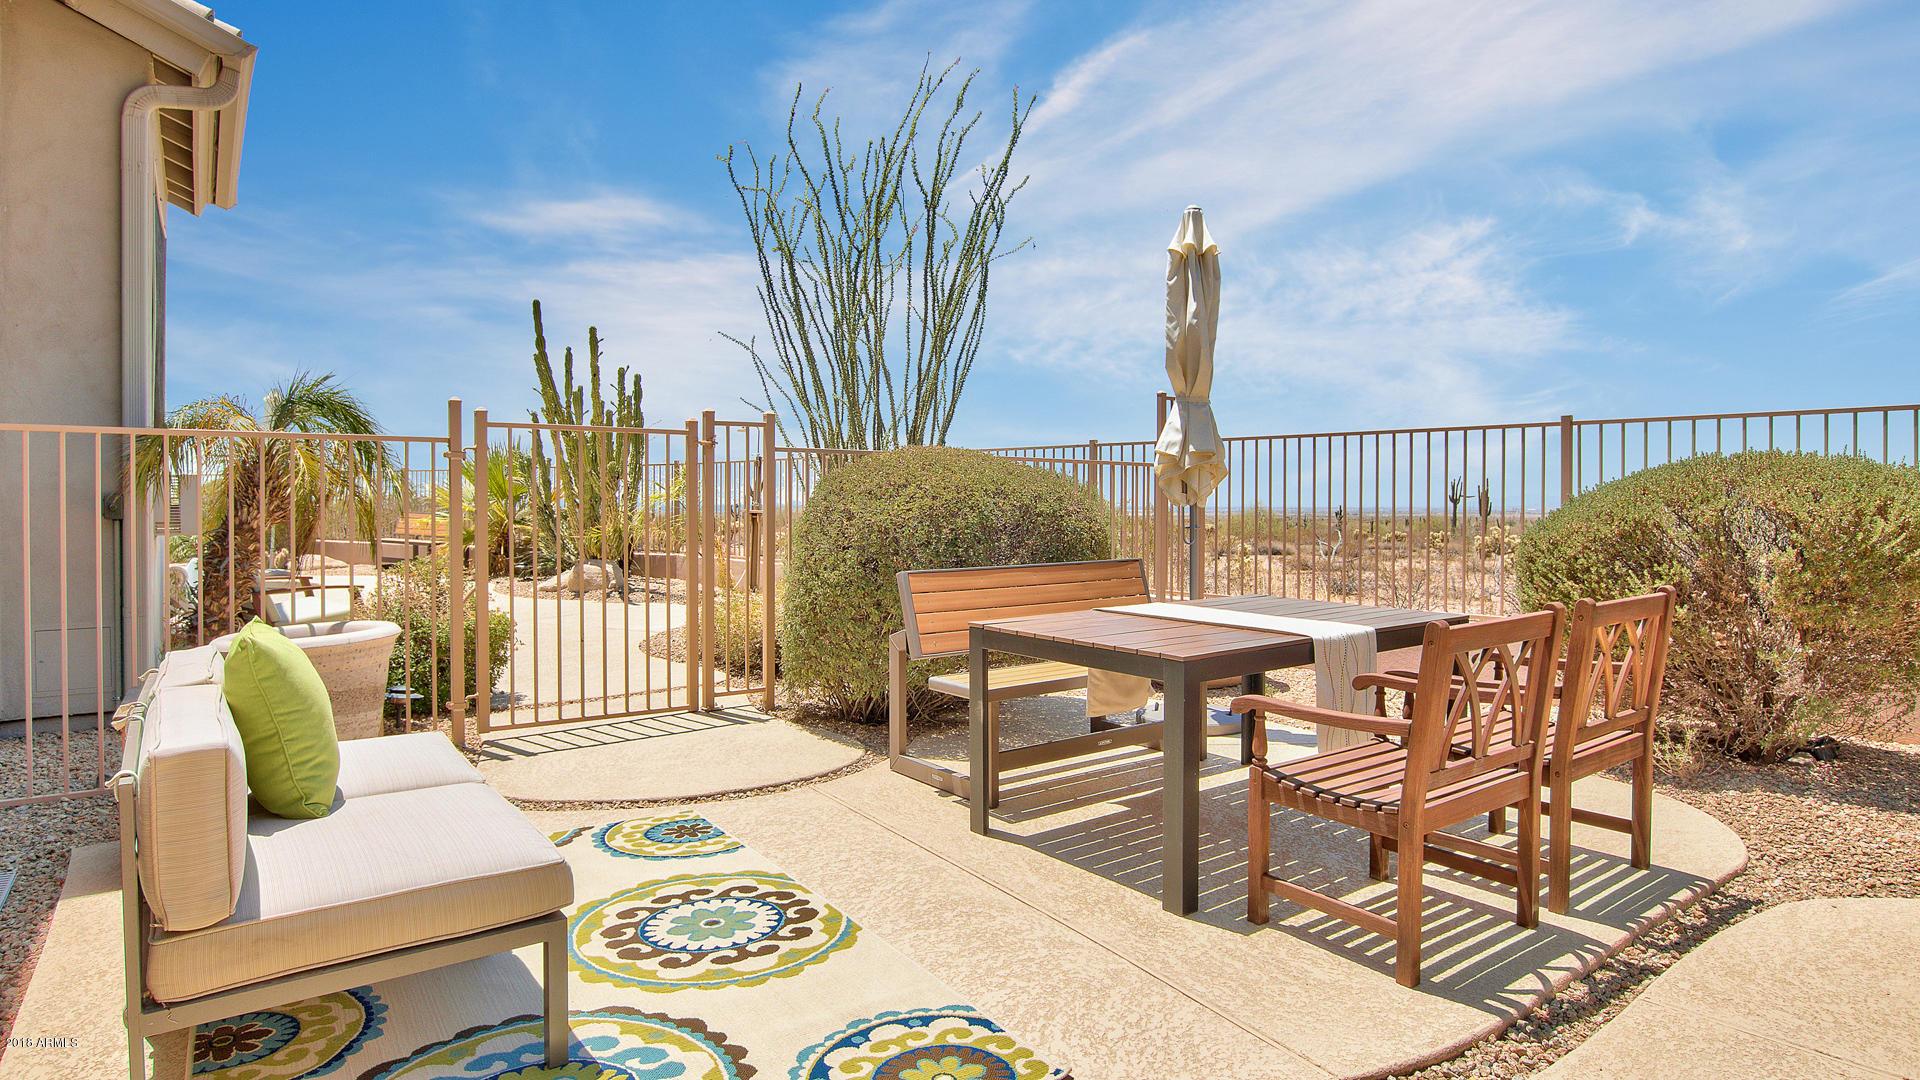 MLS 5734094 13475 E DEL TIMBRE Drive, Scottsdale, AZ 85259 Scottsdale AZ Private Pool